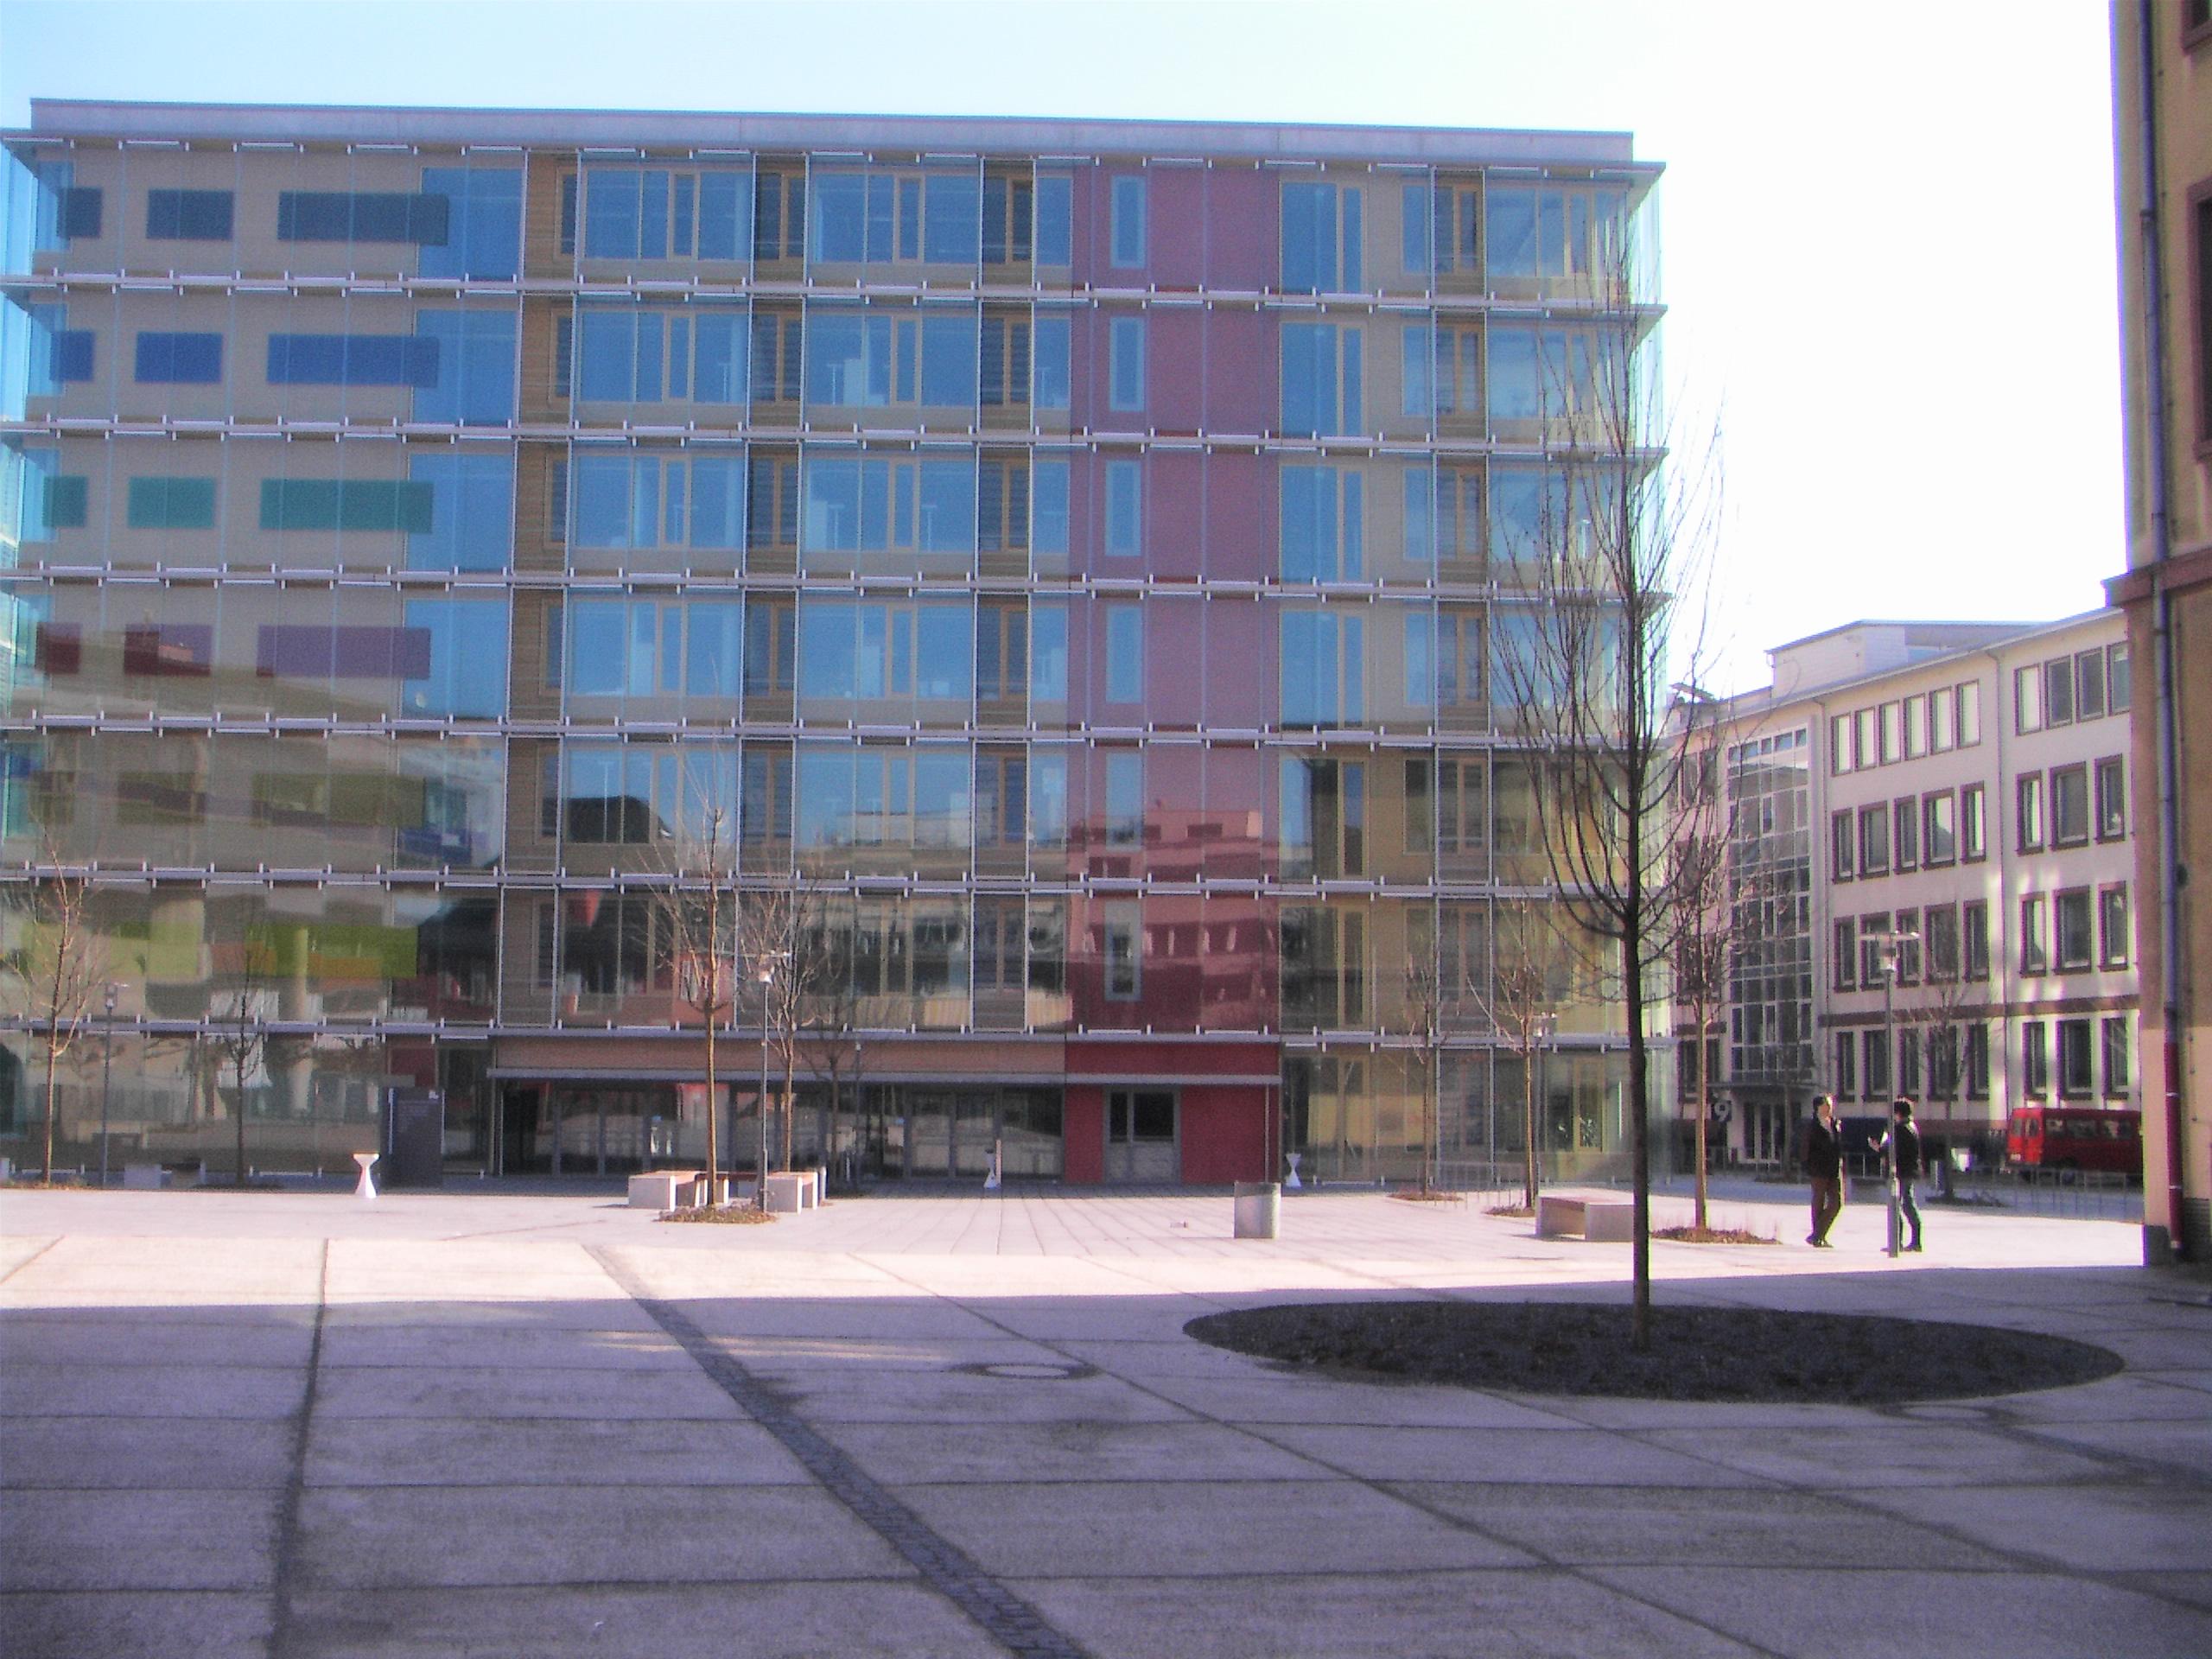 Fachhochschule frankfurt am main - Fh frankfurt architektur ...